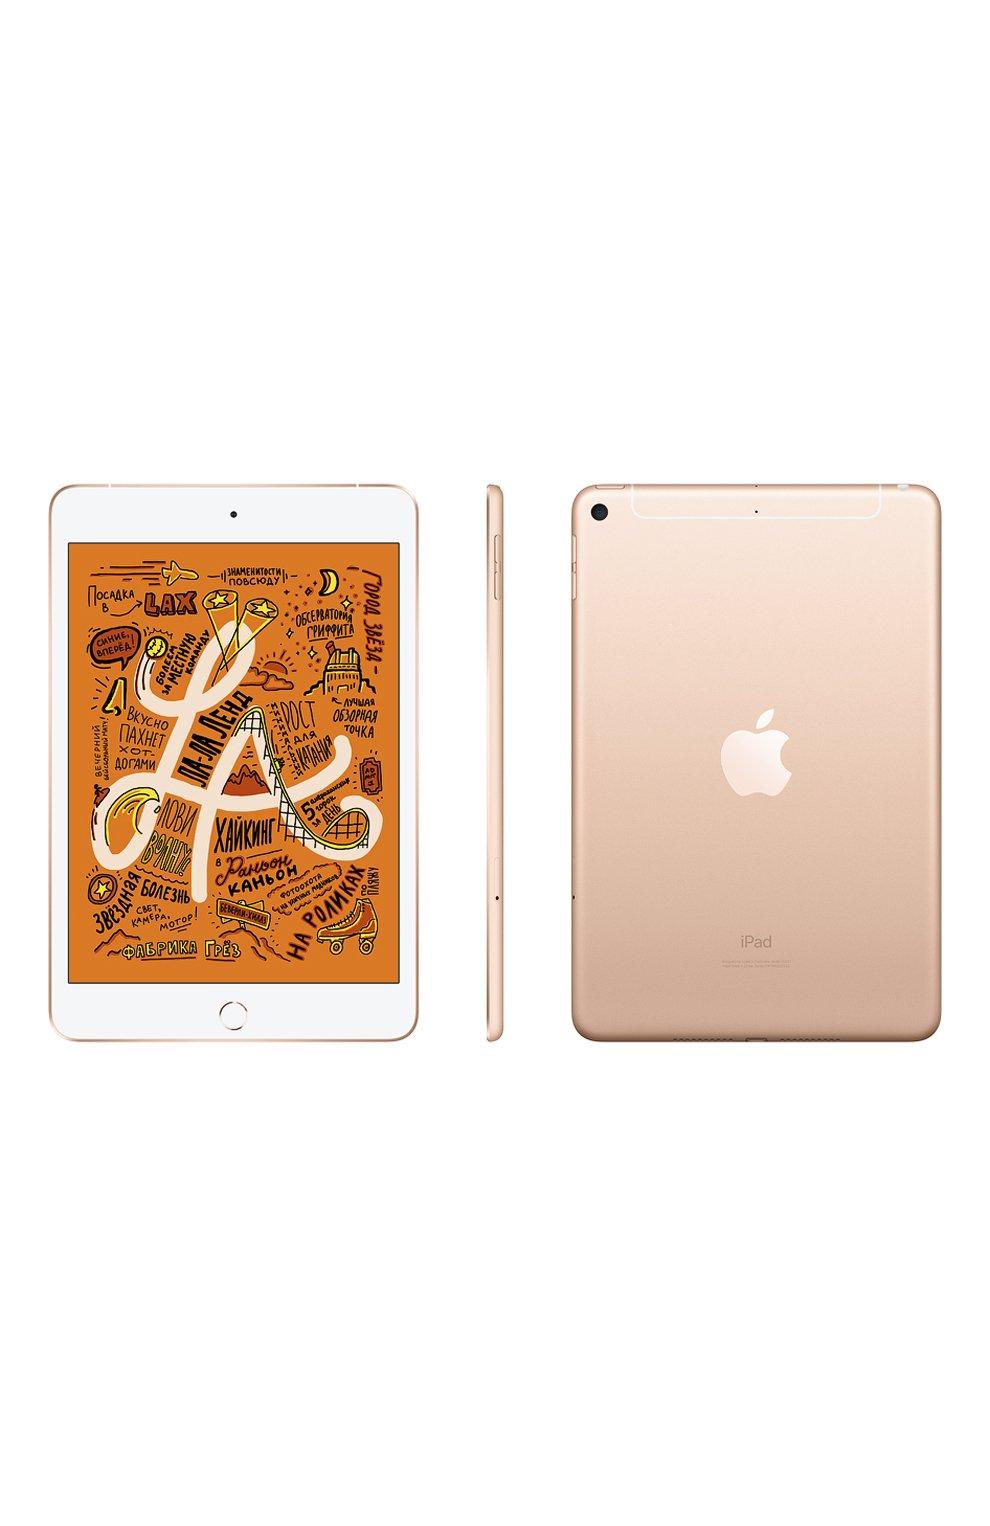 Ipad mini wi-fi + cellular 256gb gold APPLE  gold цвета, арт. MUXE2RU/A | Фото 2